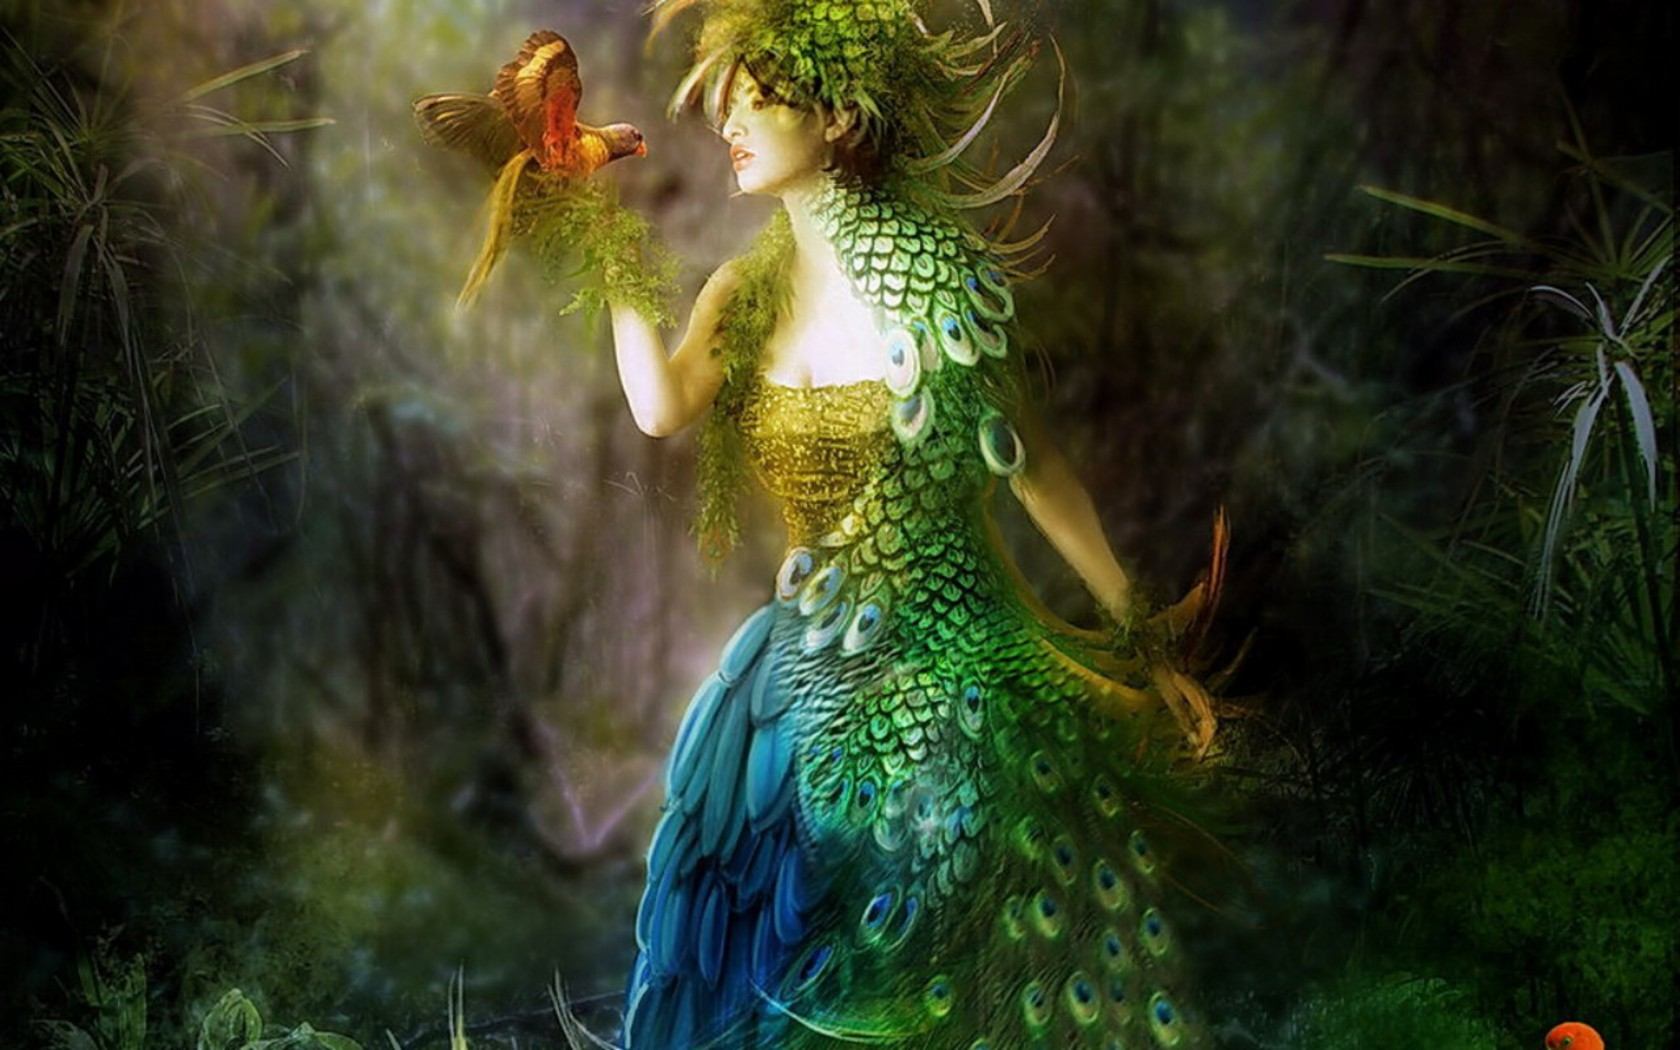 http://mimifee.files.wordpress.com/2011/04/379355-1680x1050-peacock-fairy.jpg